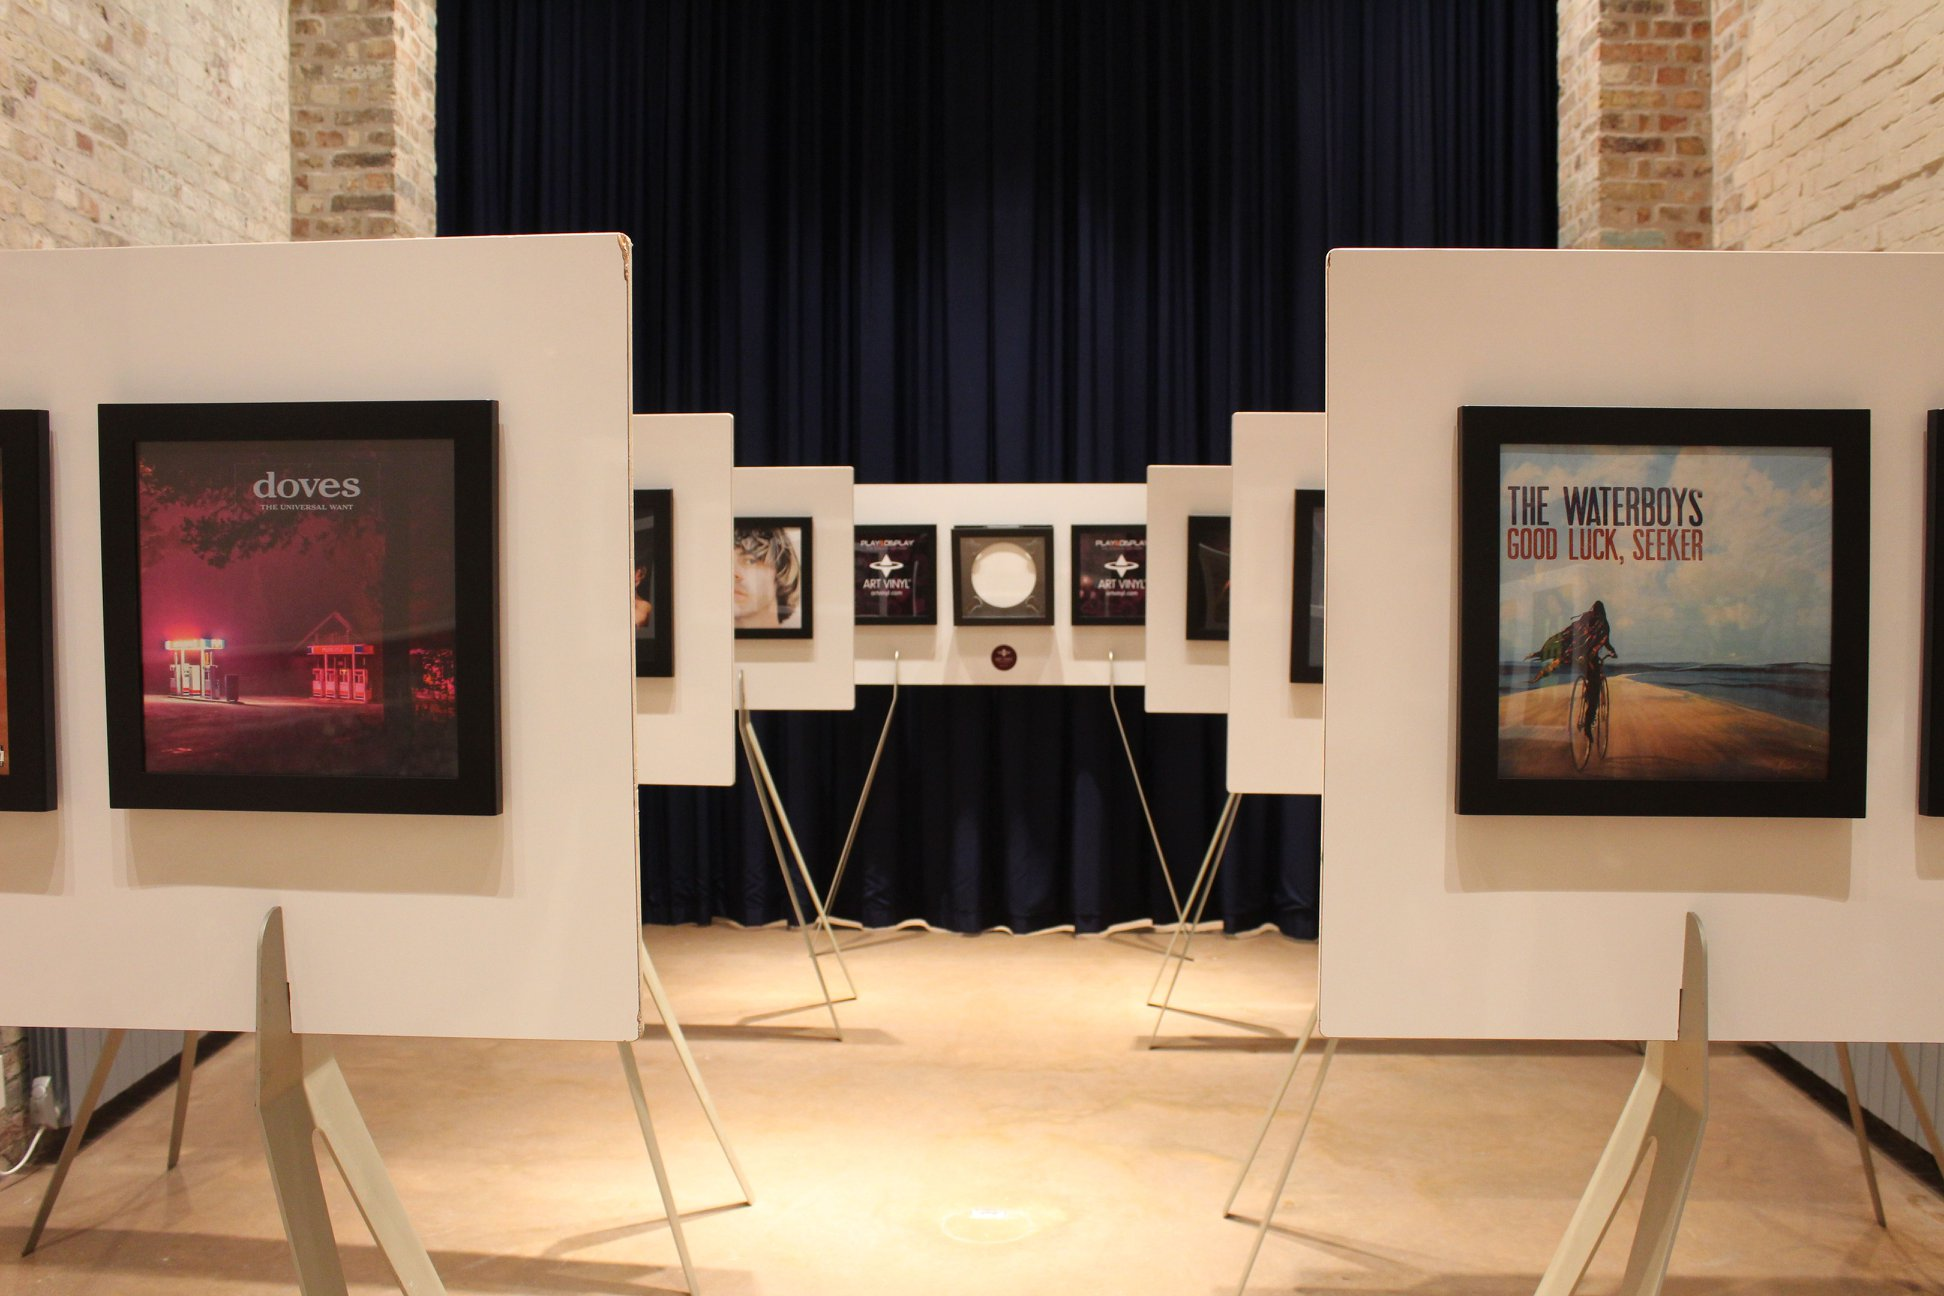 Best Art Vinyl Awards 2020 Exhibition in Customs House